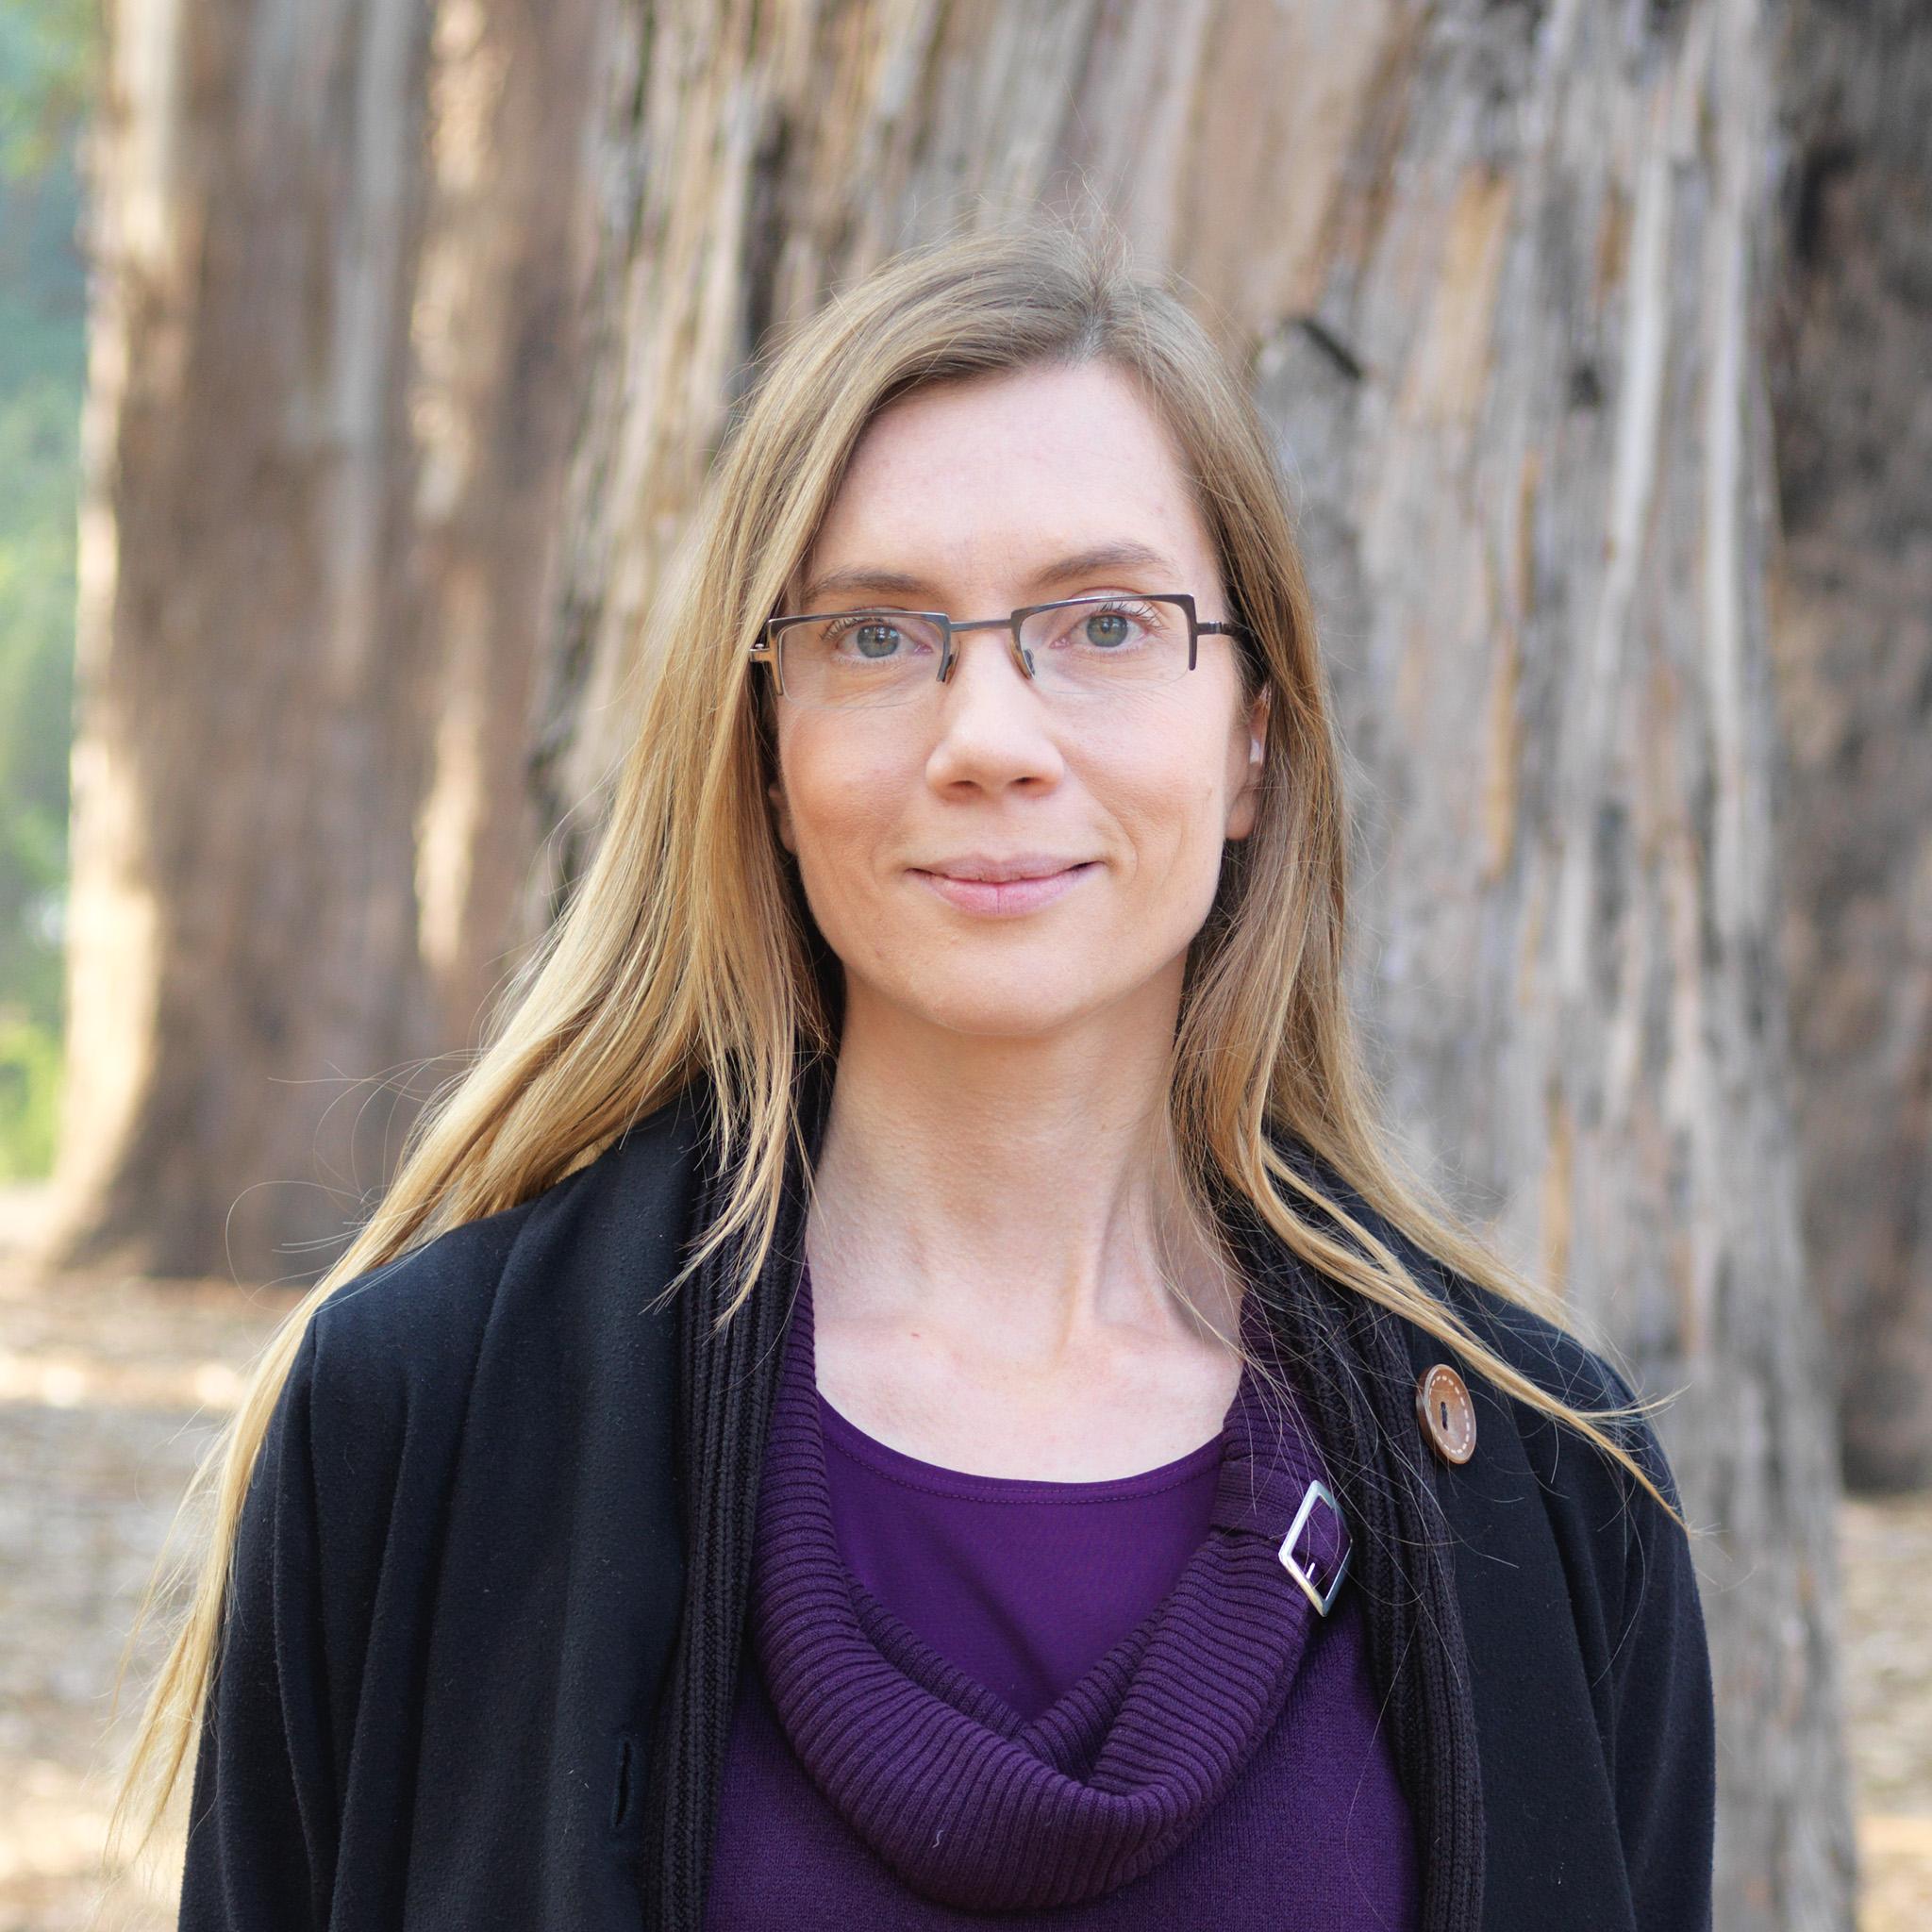 Ariane Baudhuin - Lab ManagerEmail: arianebaudhuin(at)berkeley.edu